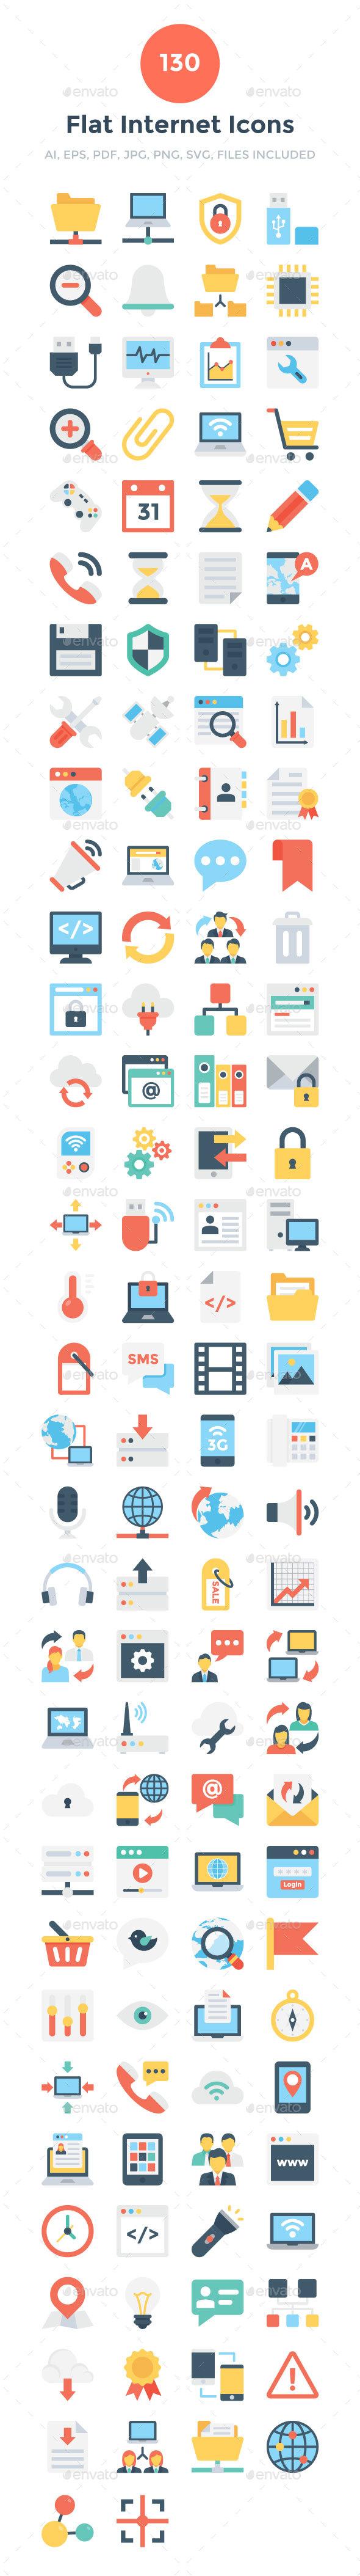 130 Flat Internet Icons - Icons